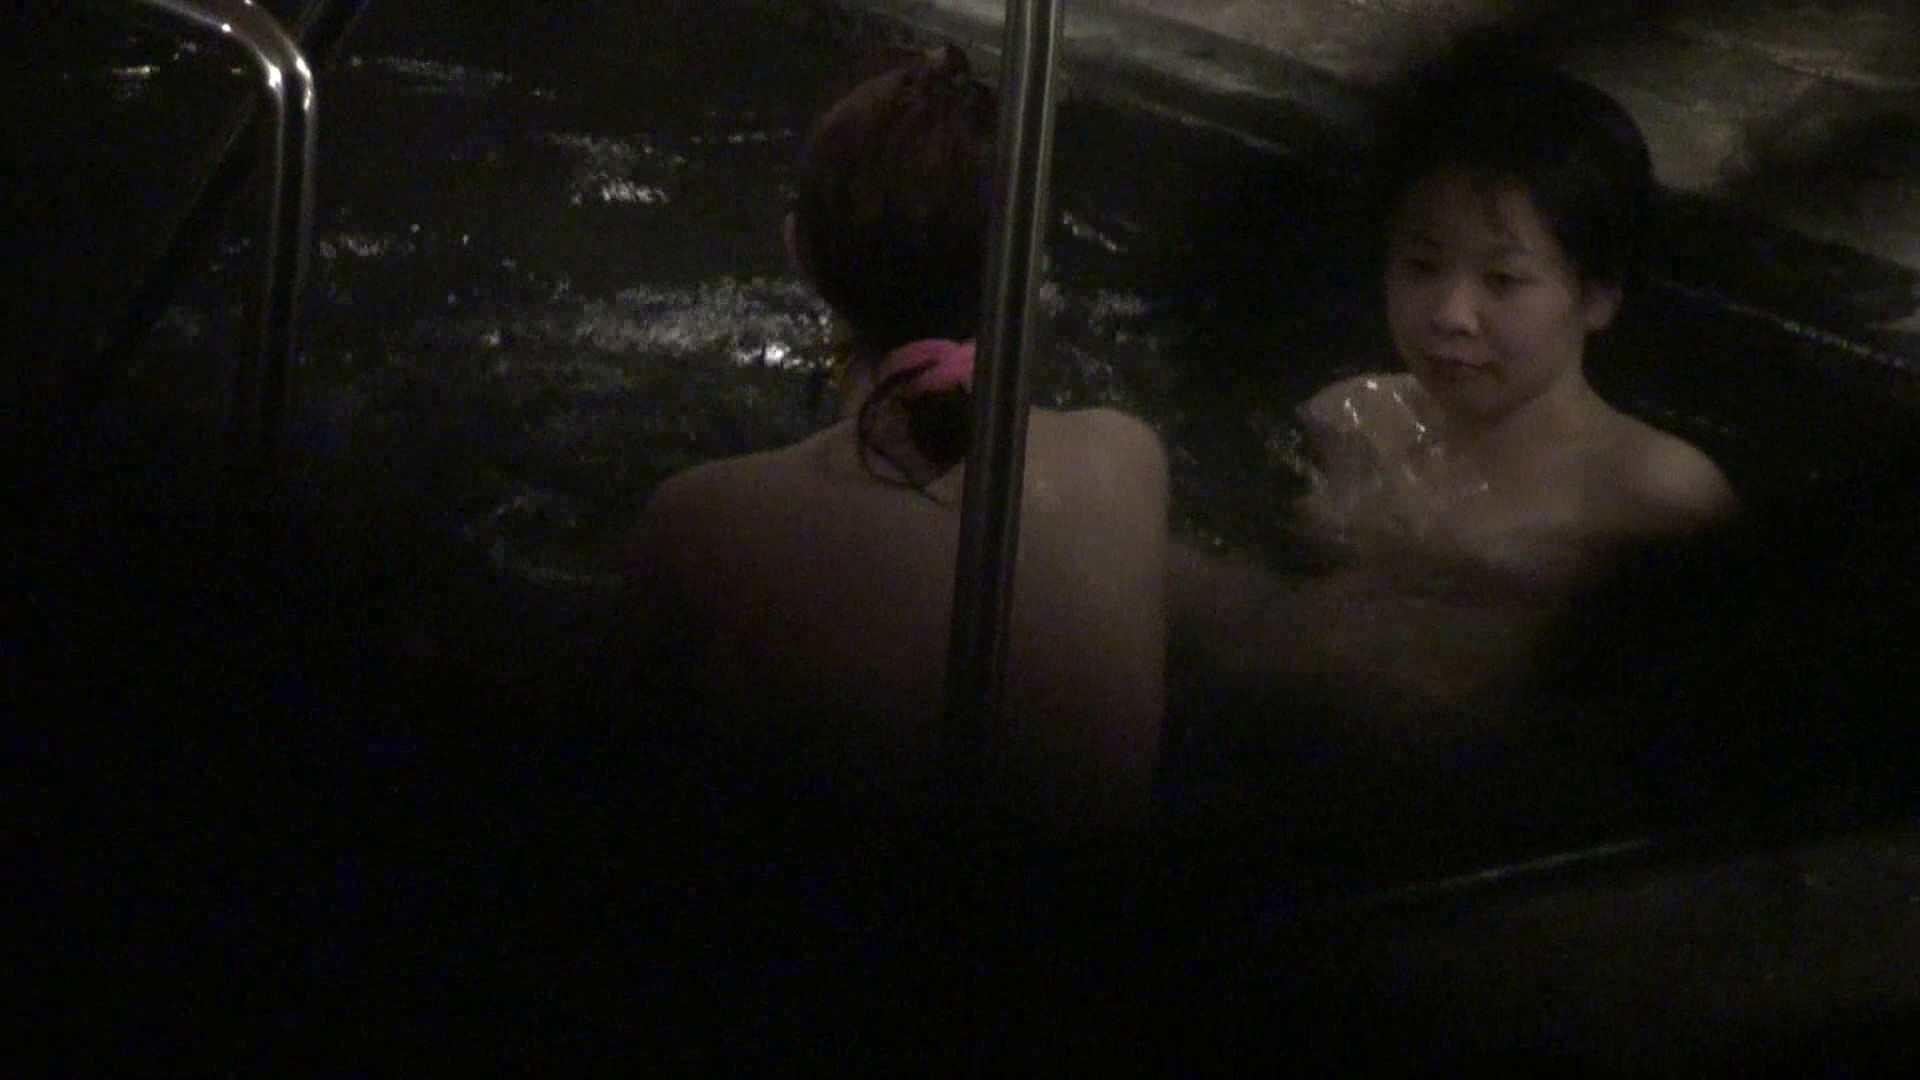 Aquaな露天風呂Vol.394 盗撮シリーズ | 露天風呂編  78PIX 63